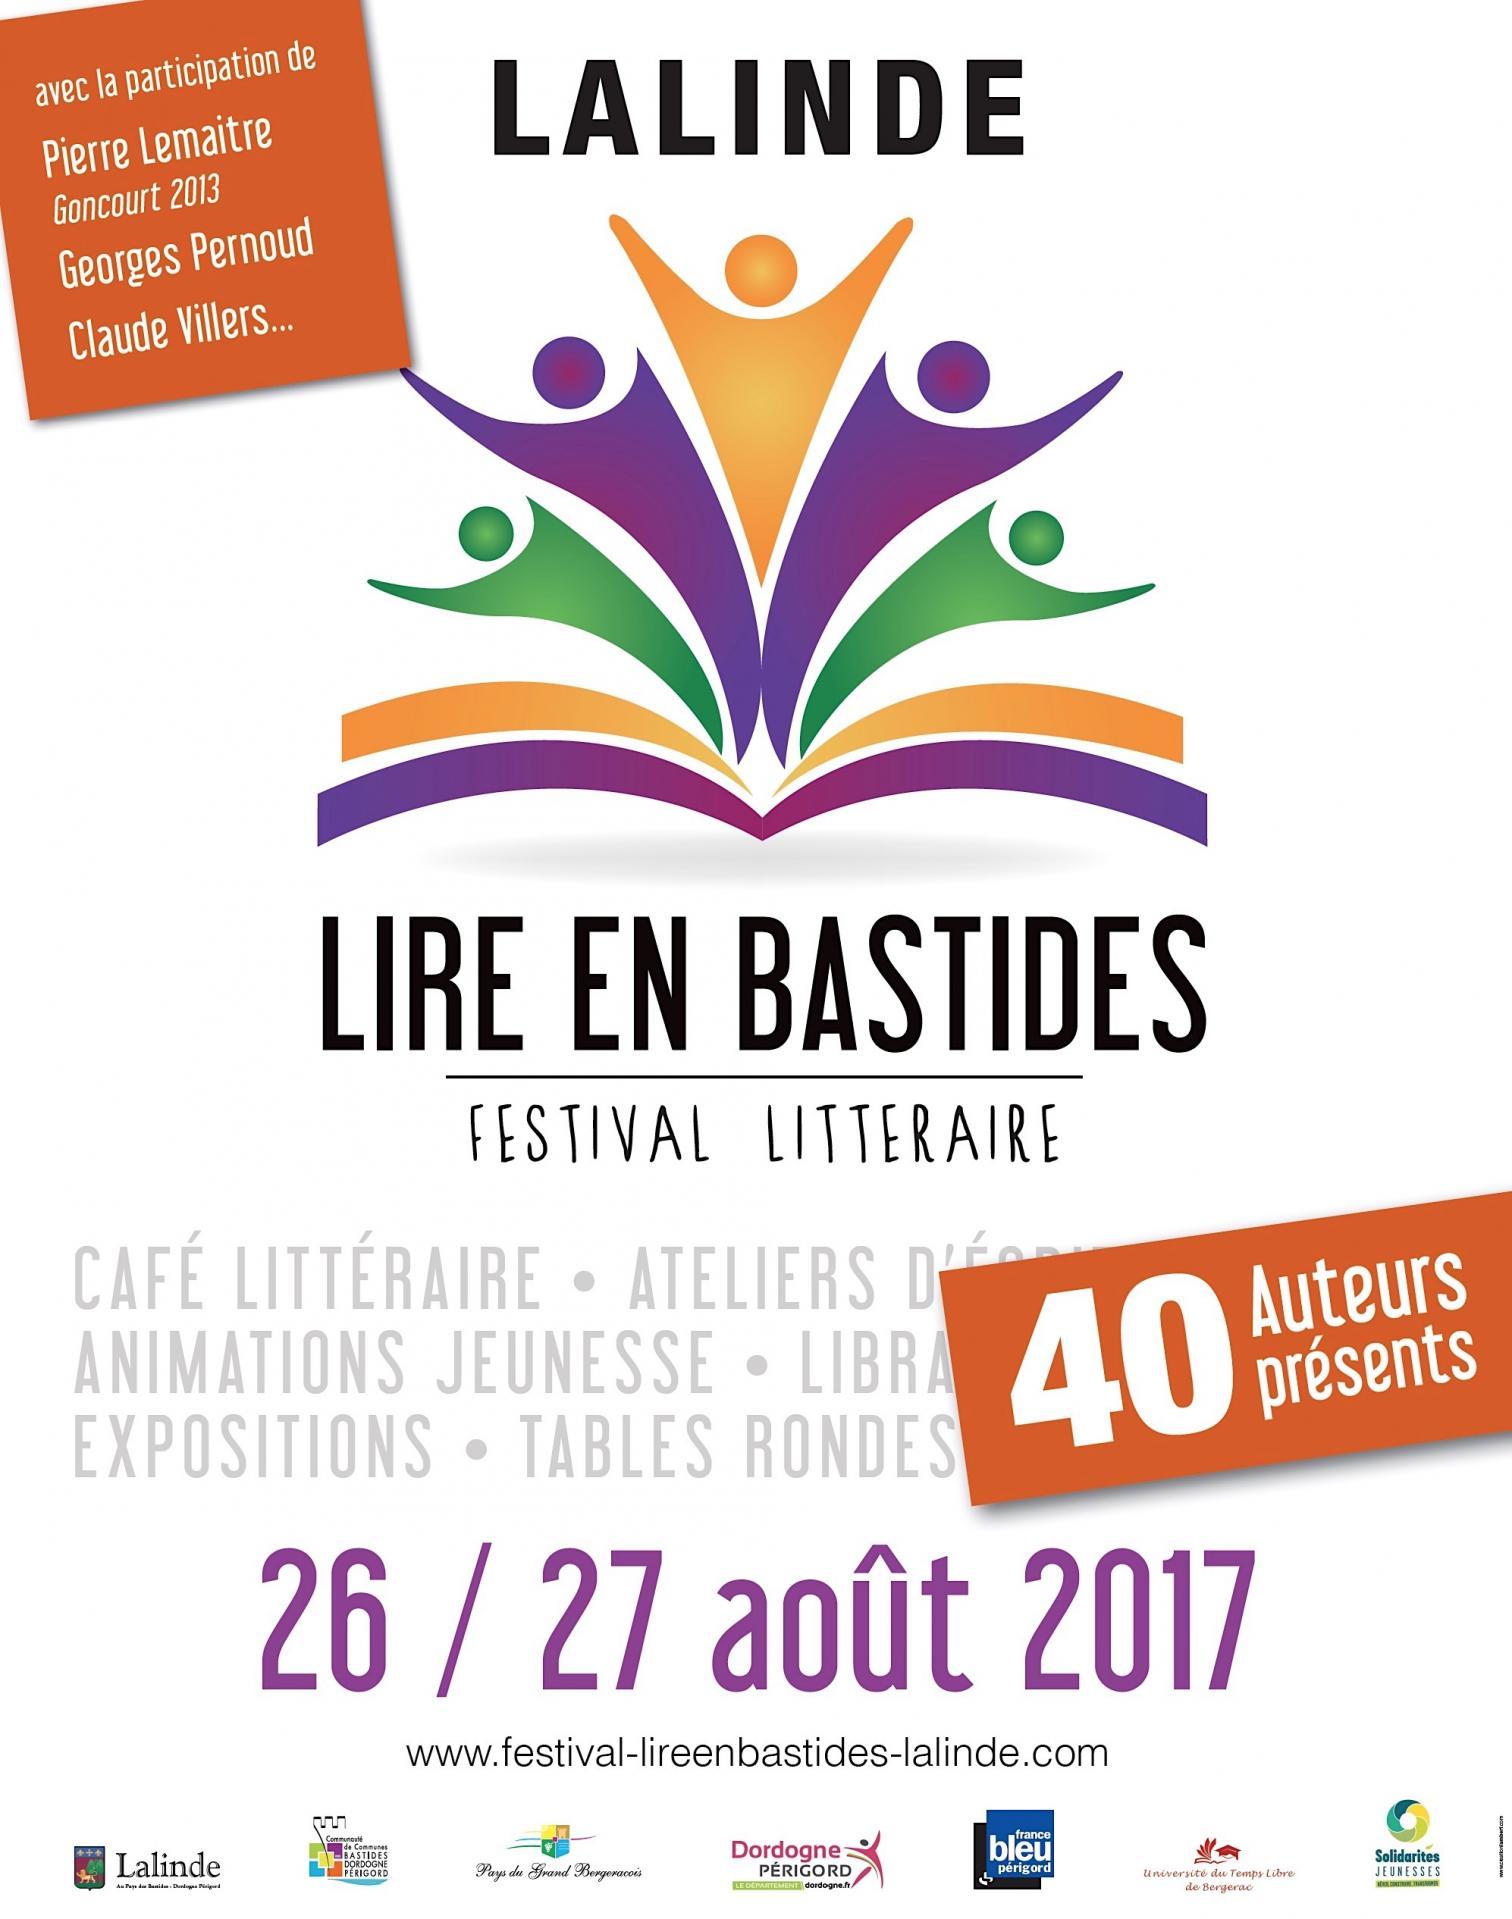 Affche festival litteraire lalinde 2017